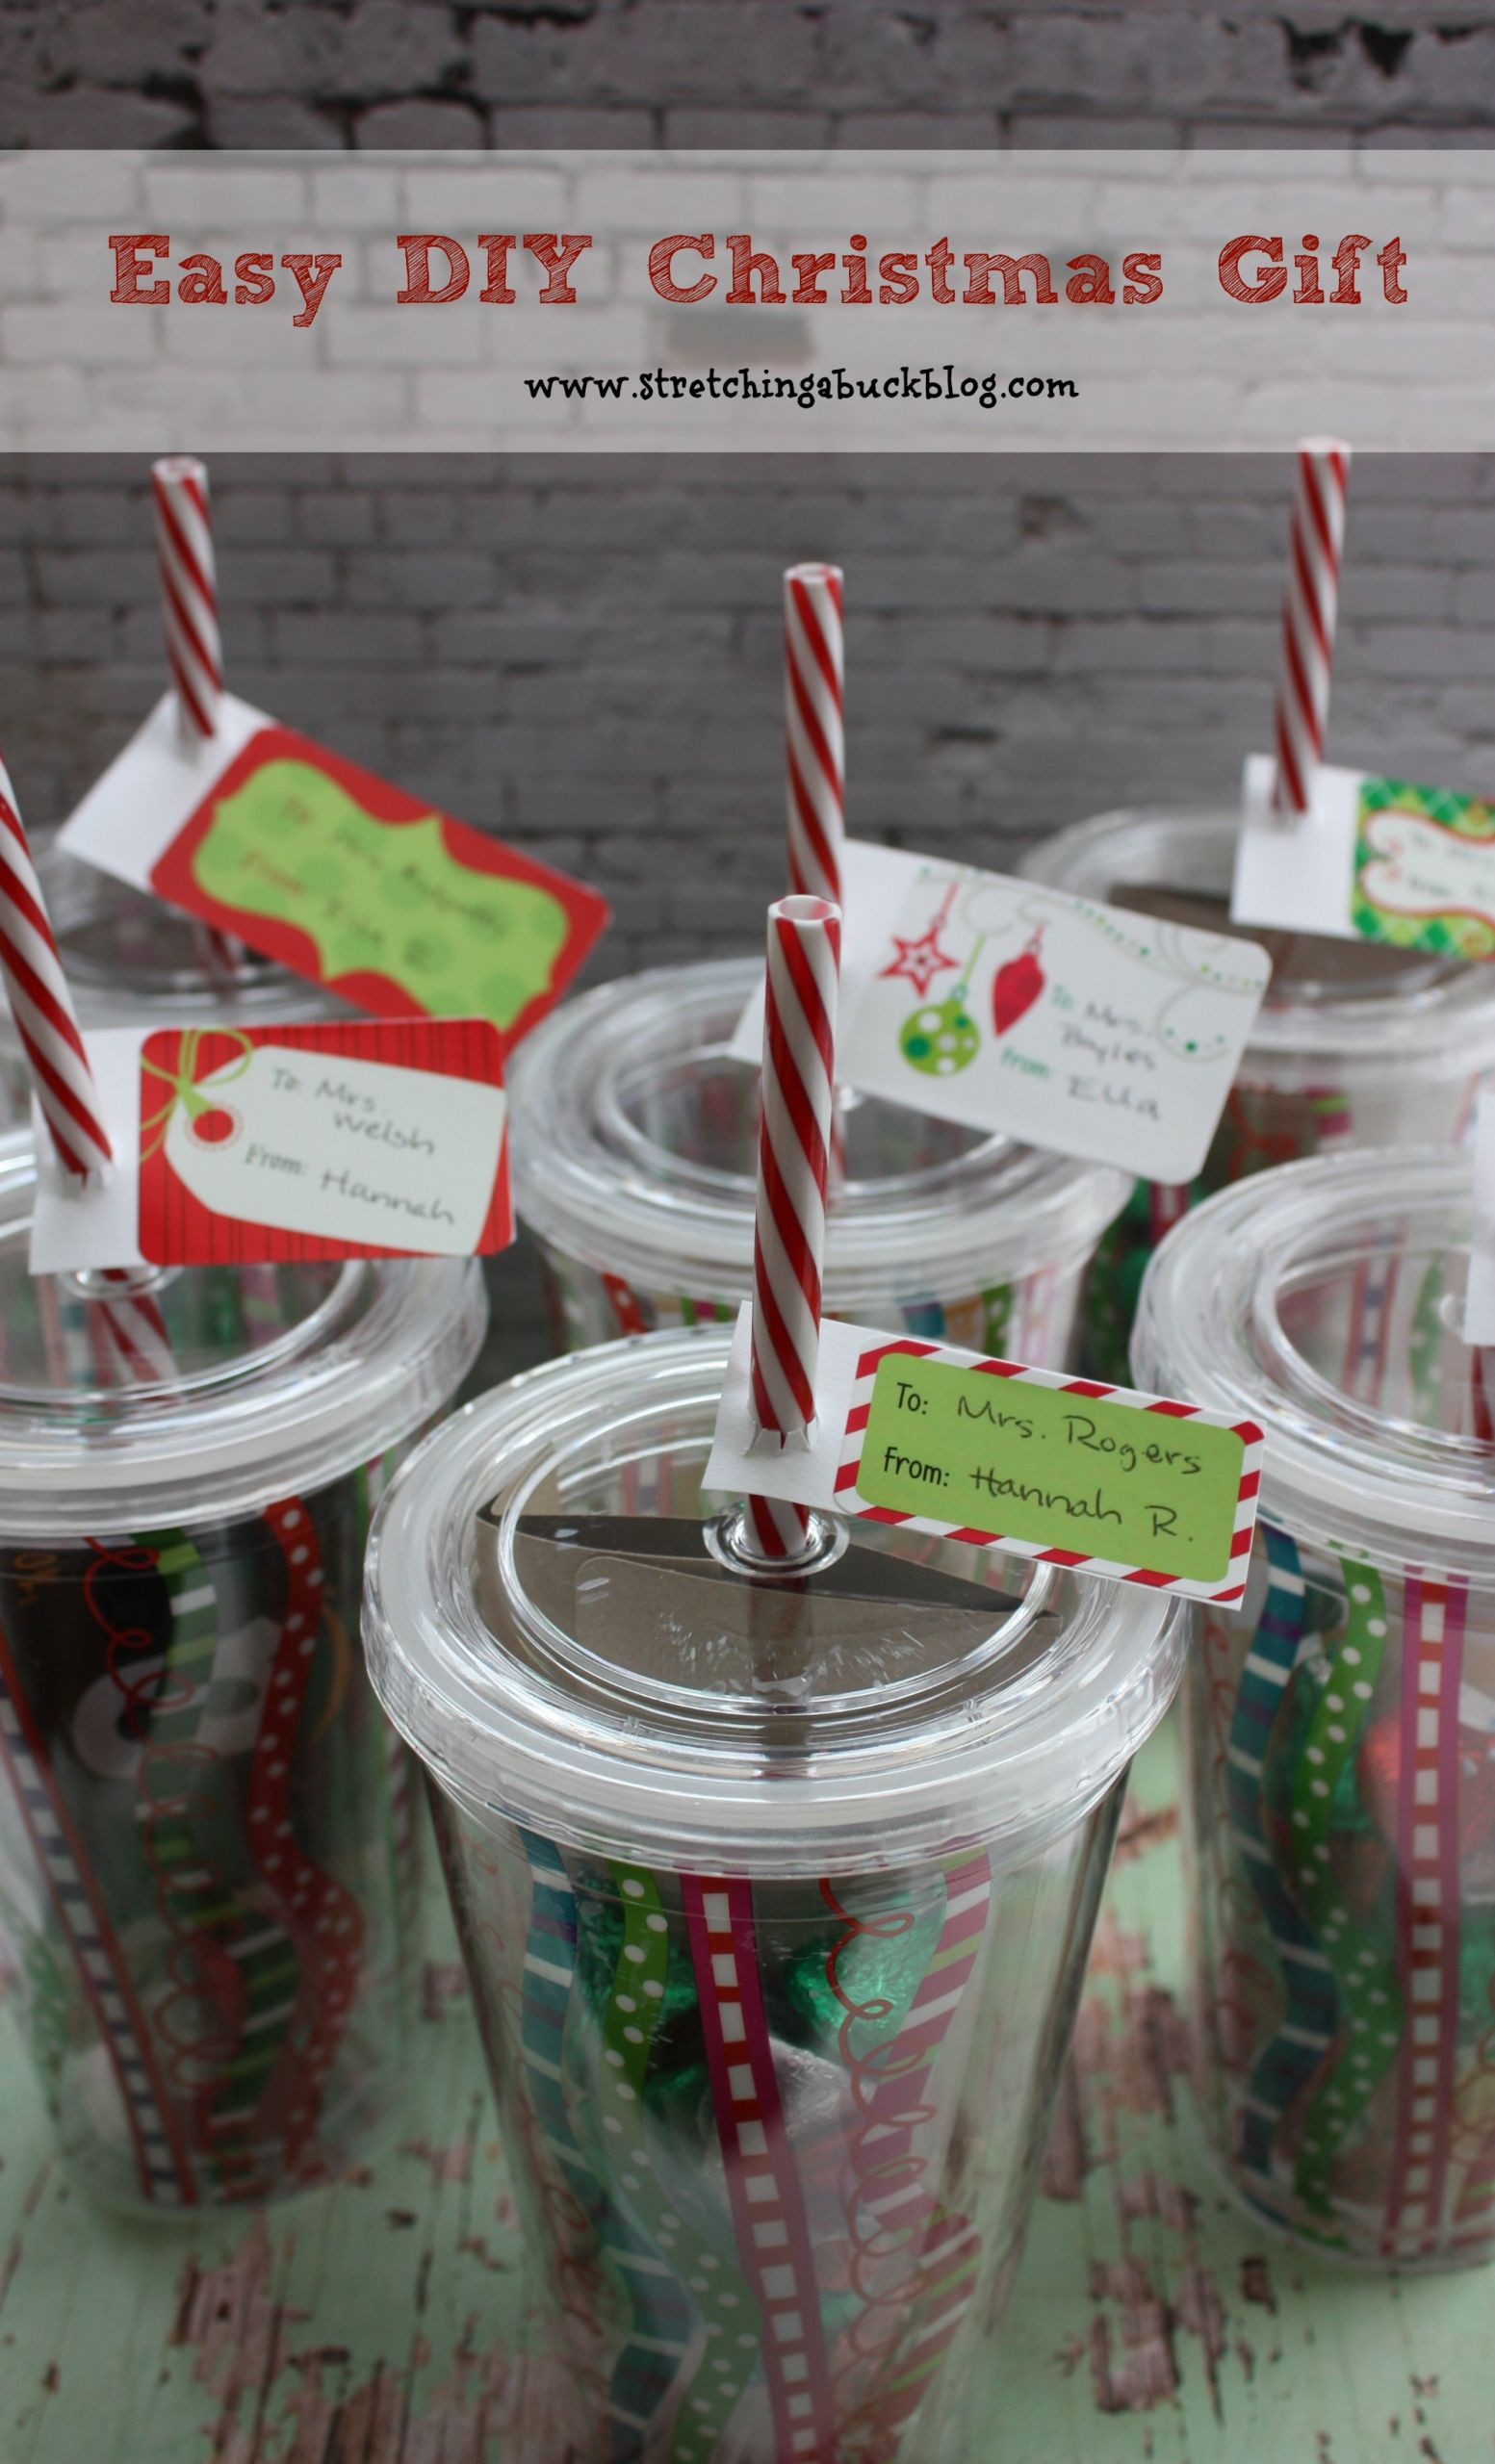 DIY Holiday Gift Ideas  Easy DIY Christmas Gift Idea for Teachers Friends More